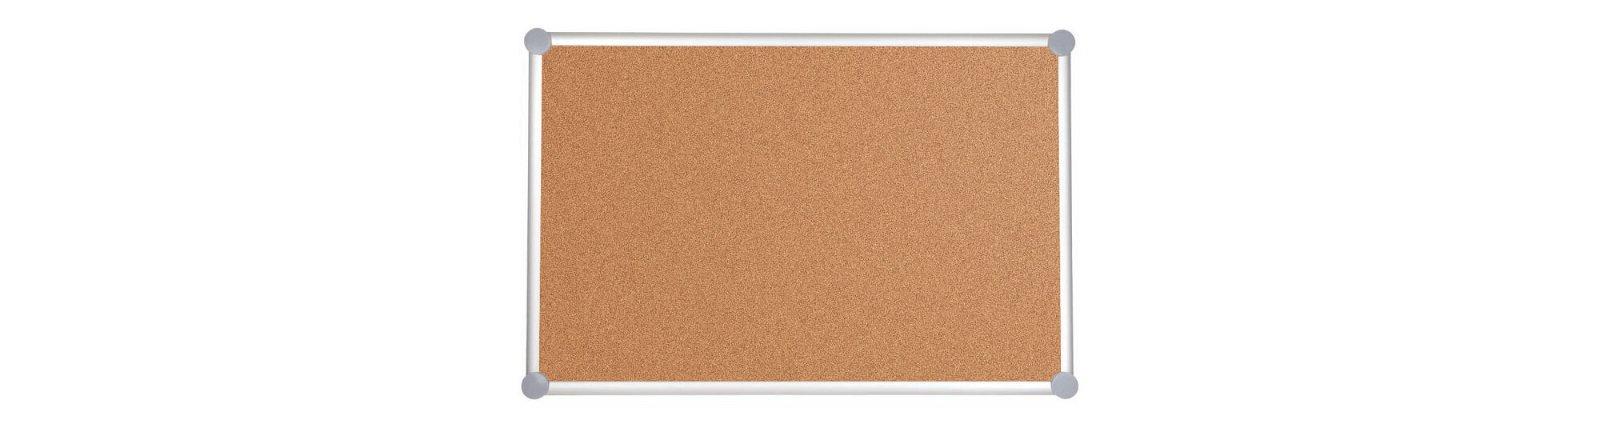 Pinnboard 2000 MAULpro, Kork, 90x120 cm, grau